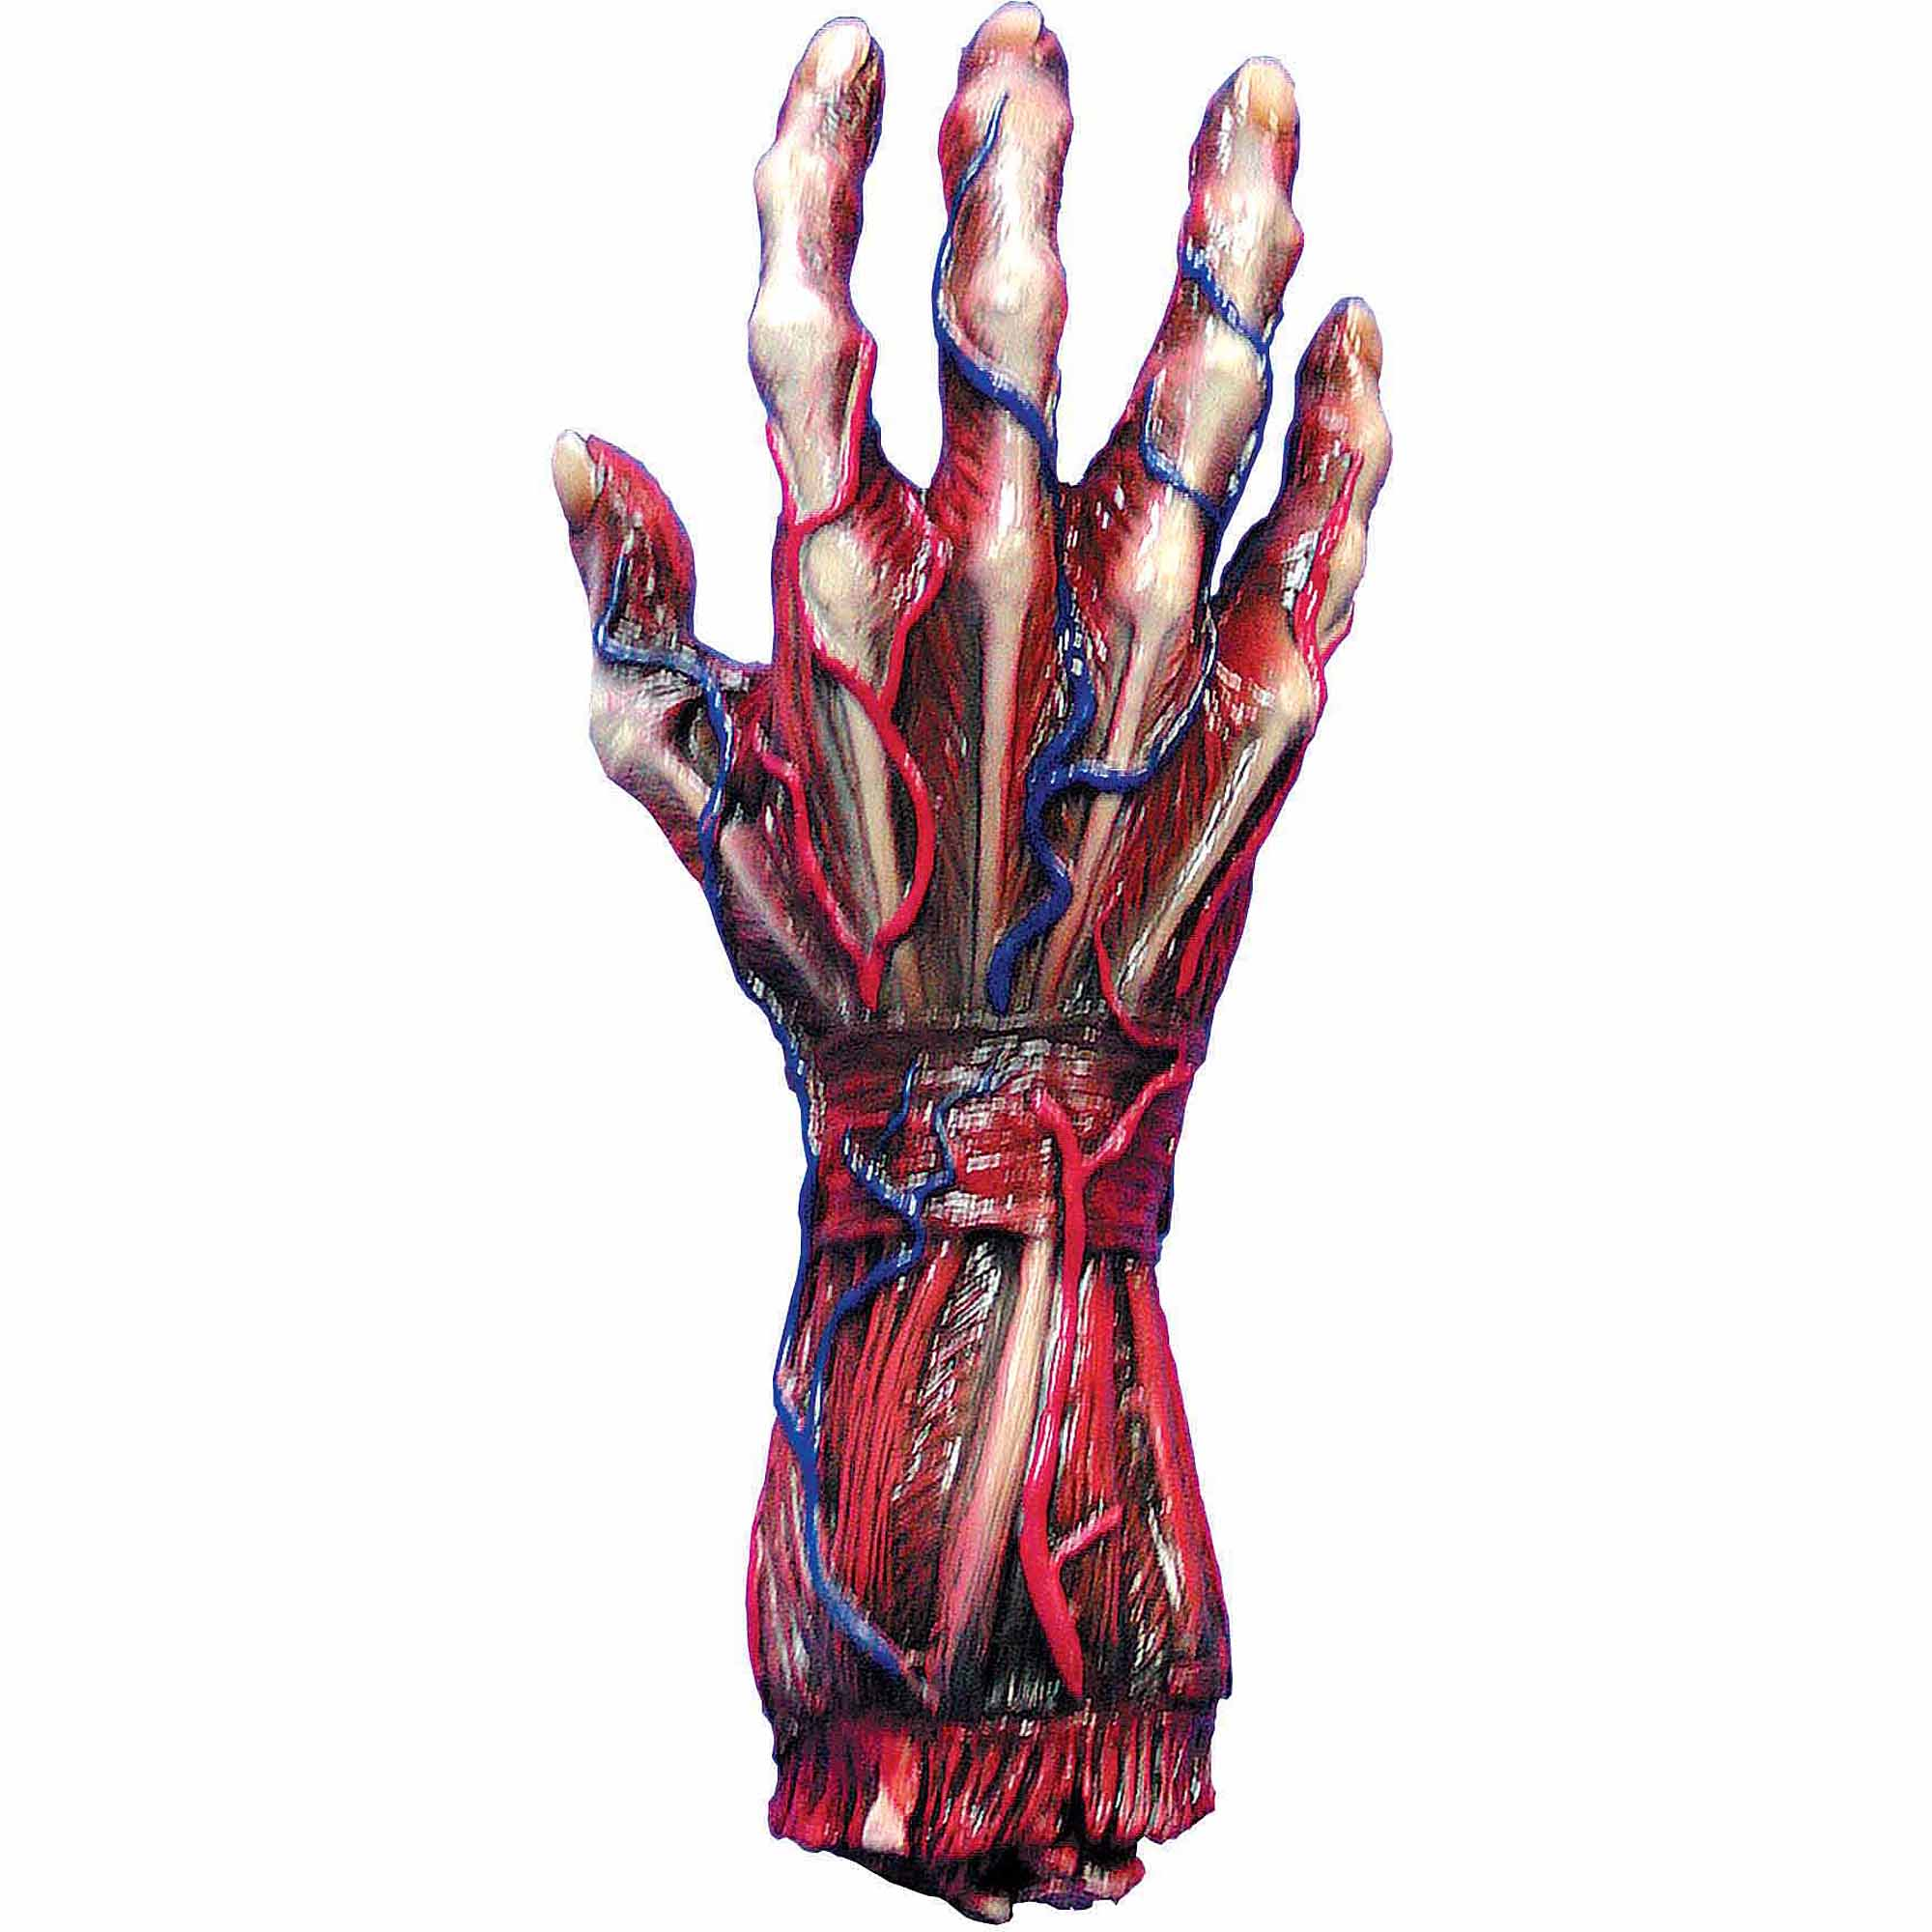 Skinned Right Hand Halloween Decoration